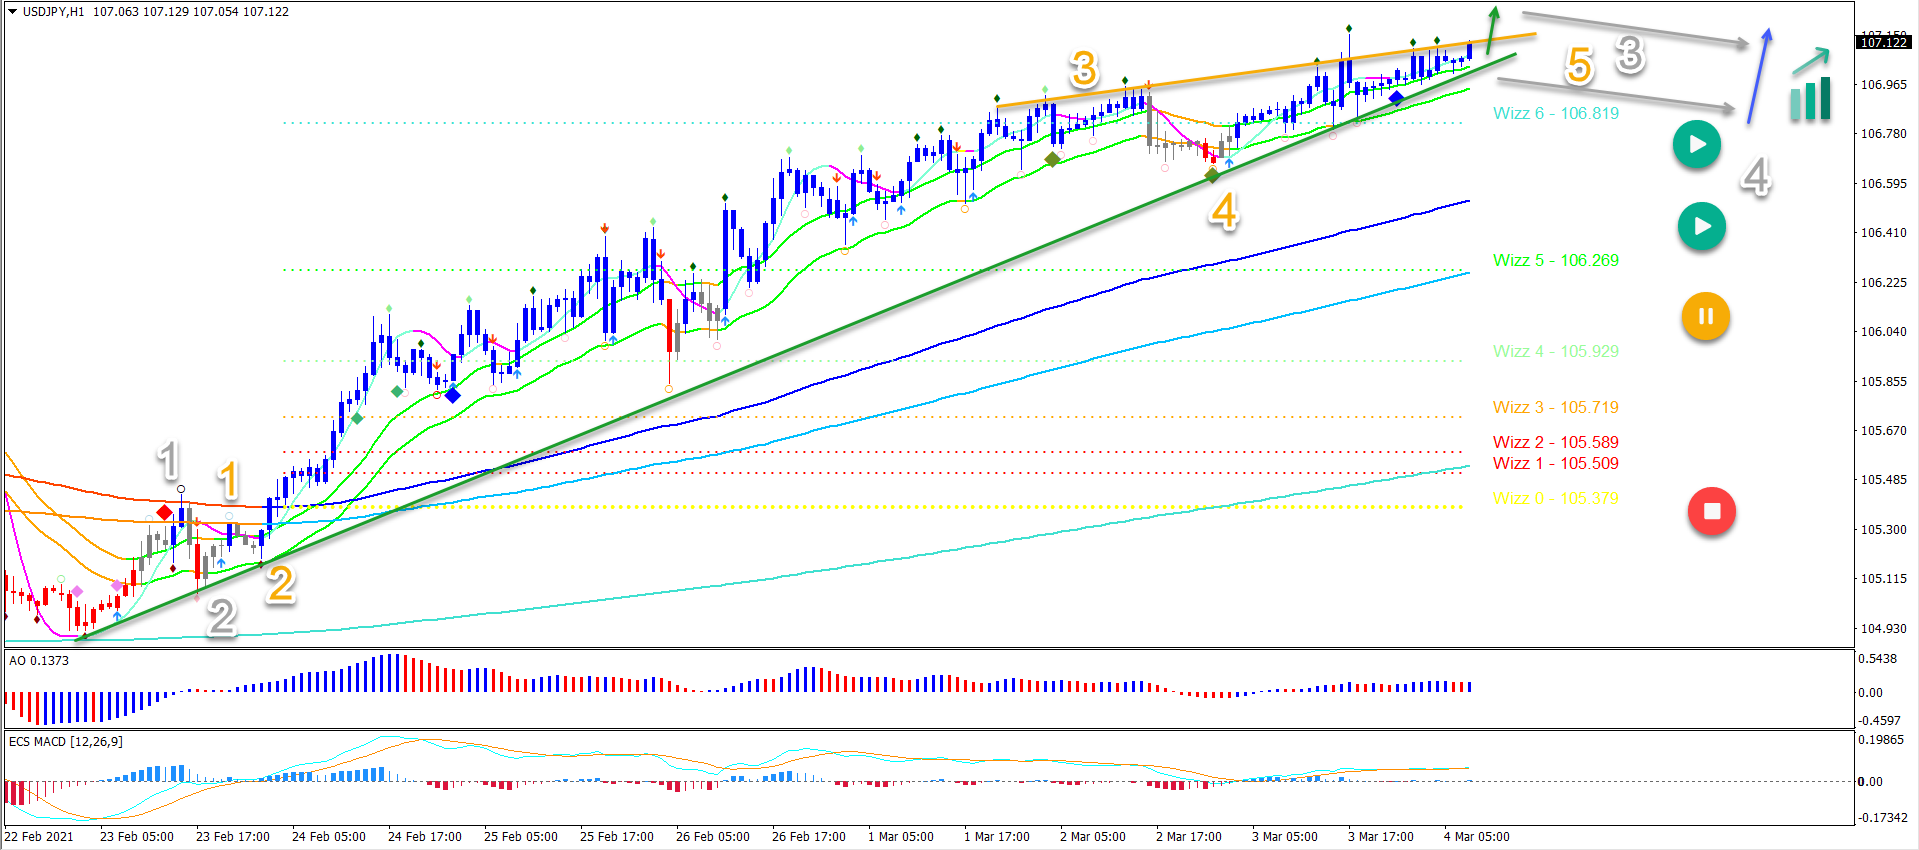 USD/JPY 04.03.2021 1 hour chart